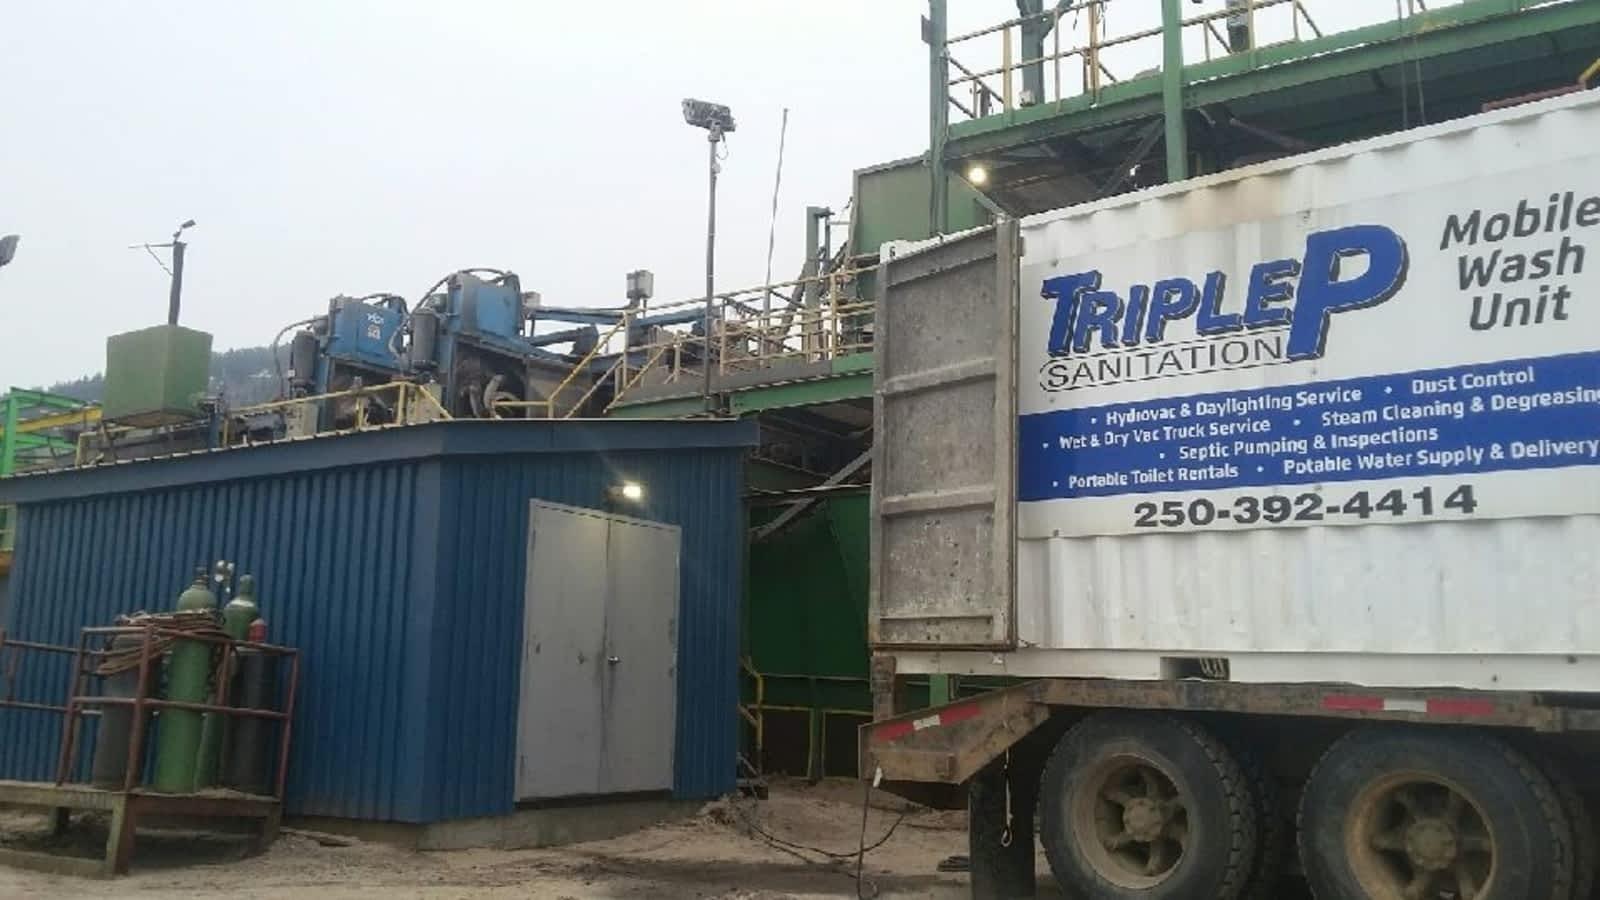 Triple P Sanitation 1998 Ltd - Opening Hours - 4705 Collier